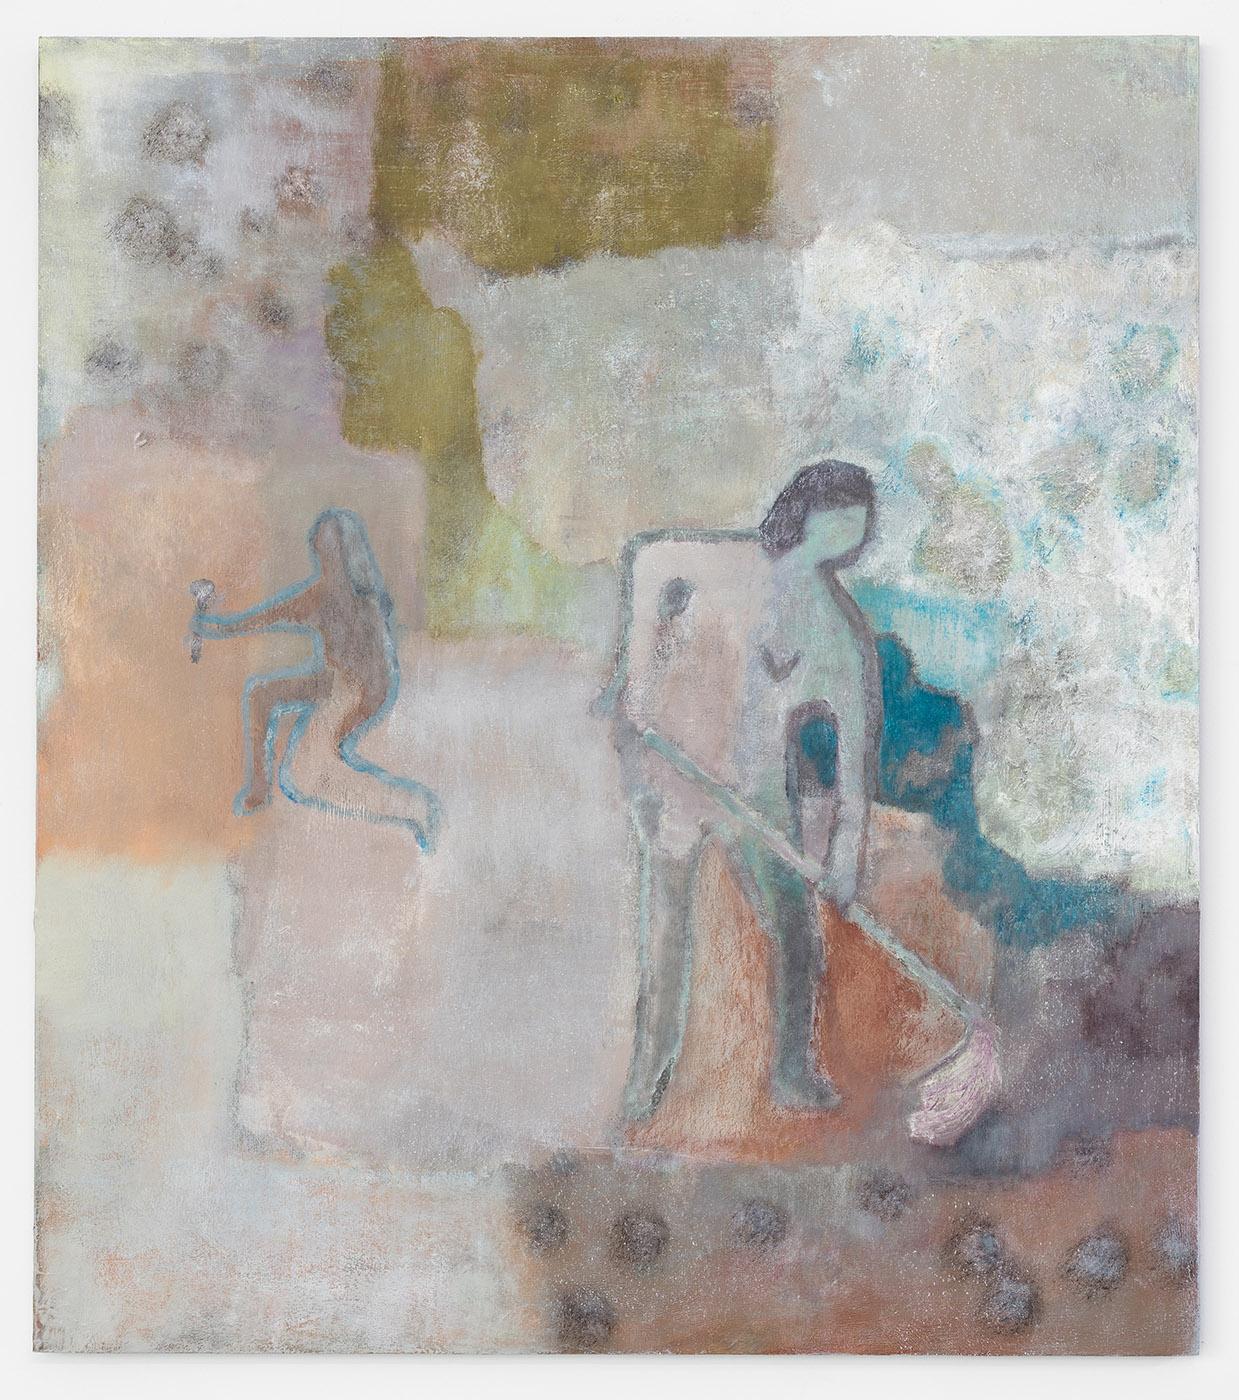 GalerieNicolasRobertNovembre2018 (2 of 27).jpg